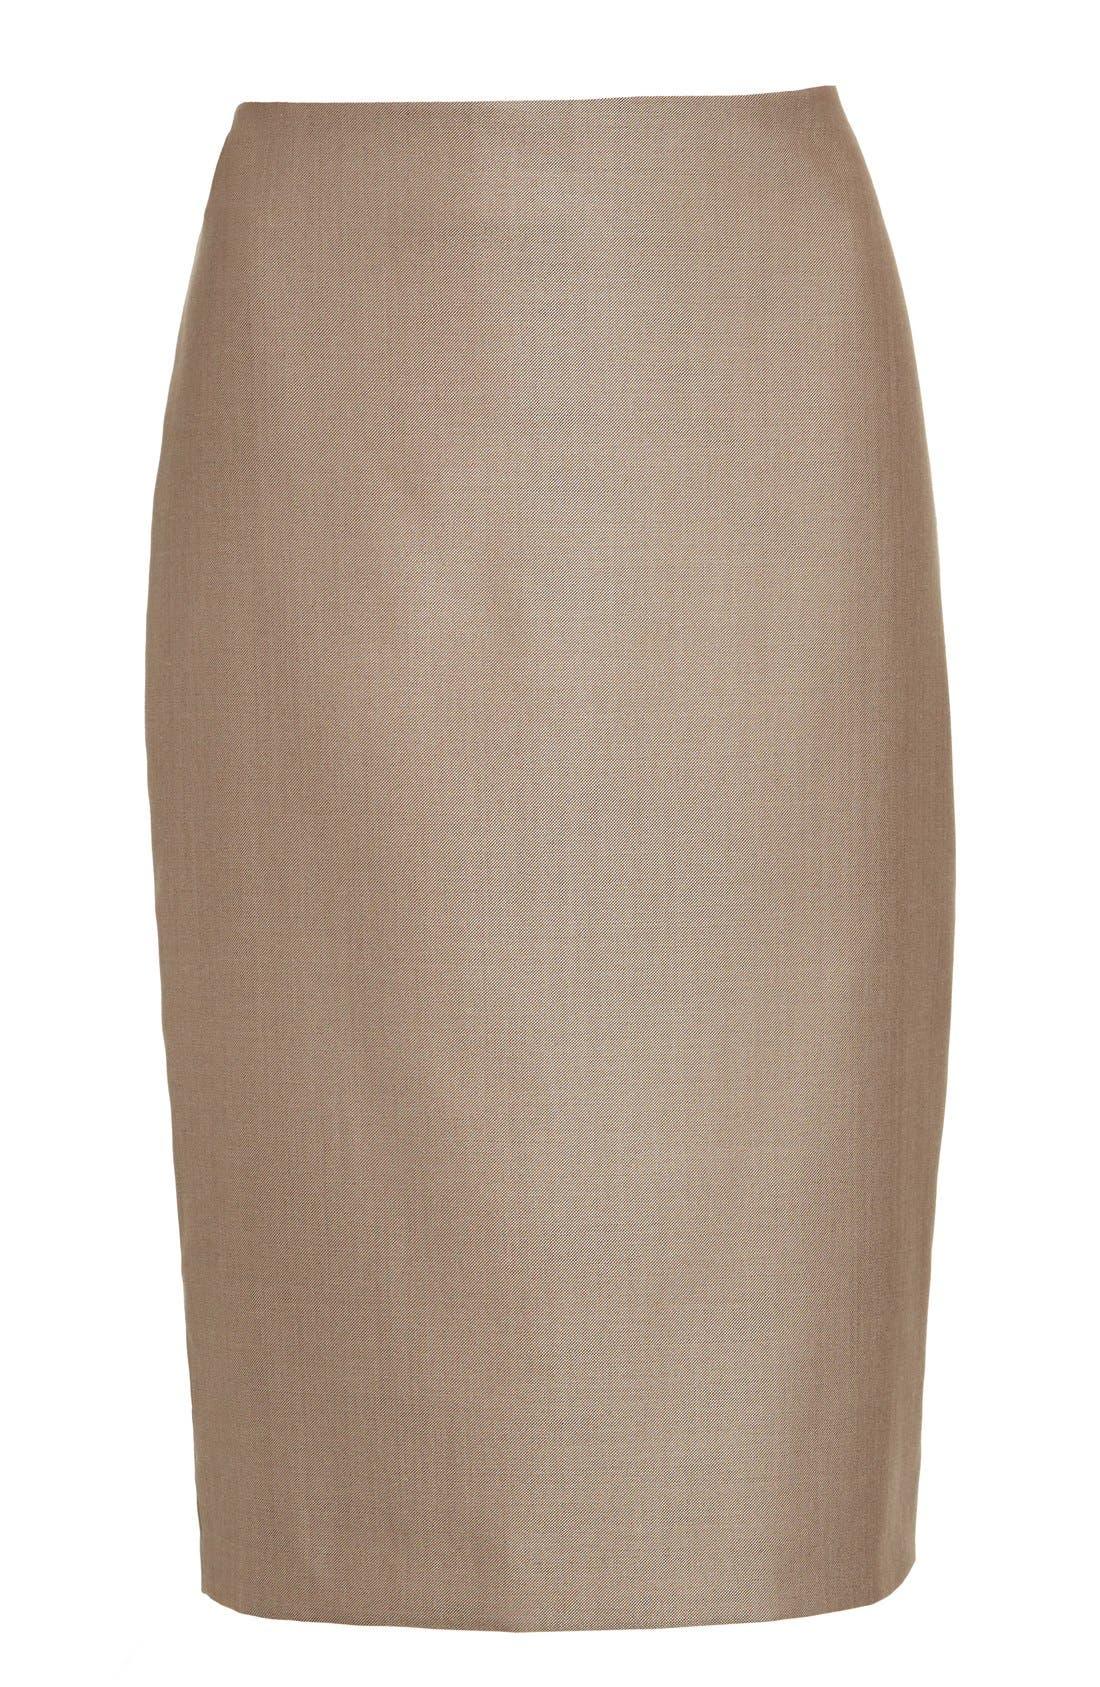 Wool Blend Pencil Skirt,                             Alternate thumbnail 8, color,                             220